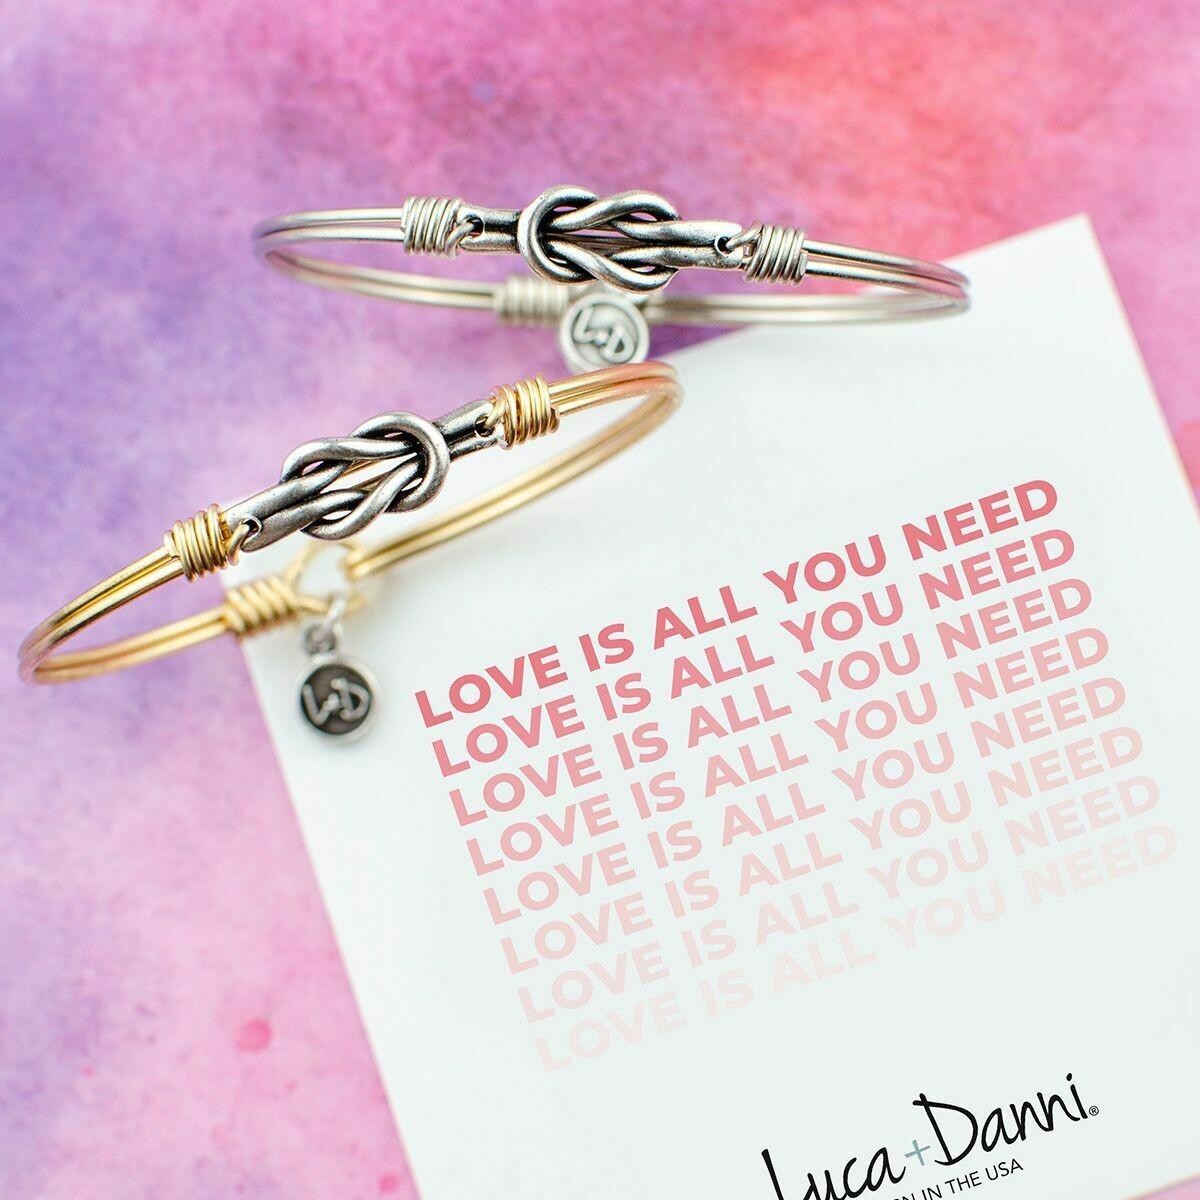 Luca + Danni Love Knot Bracelet